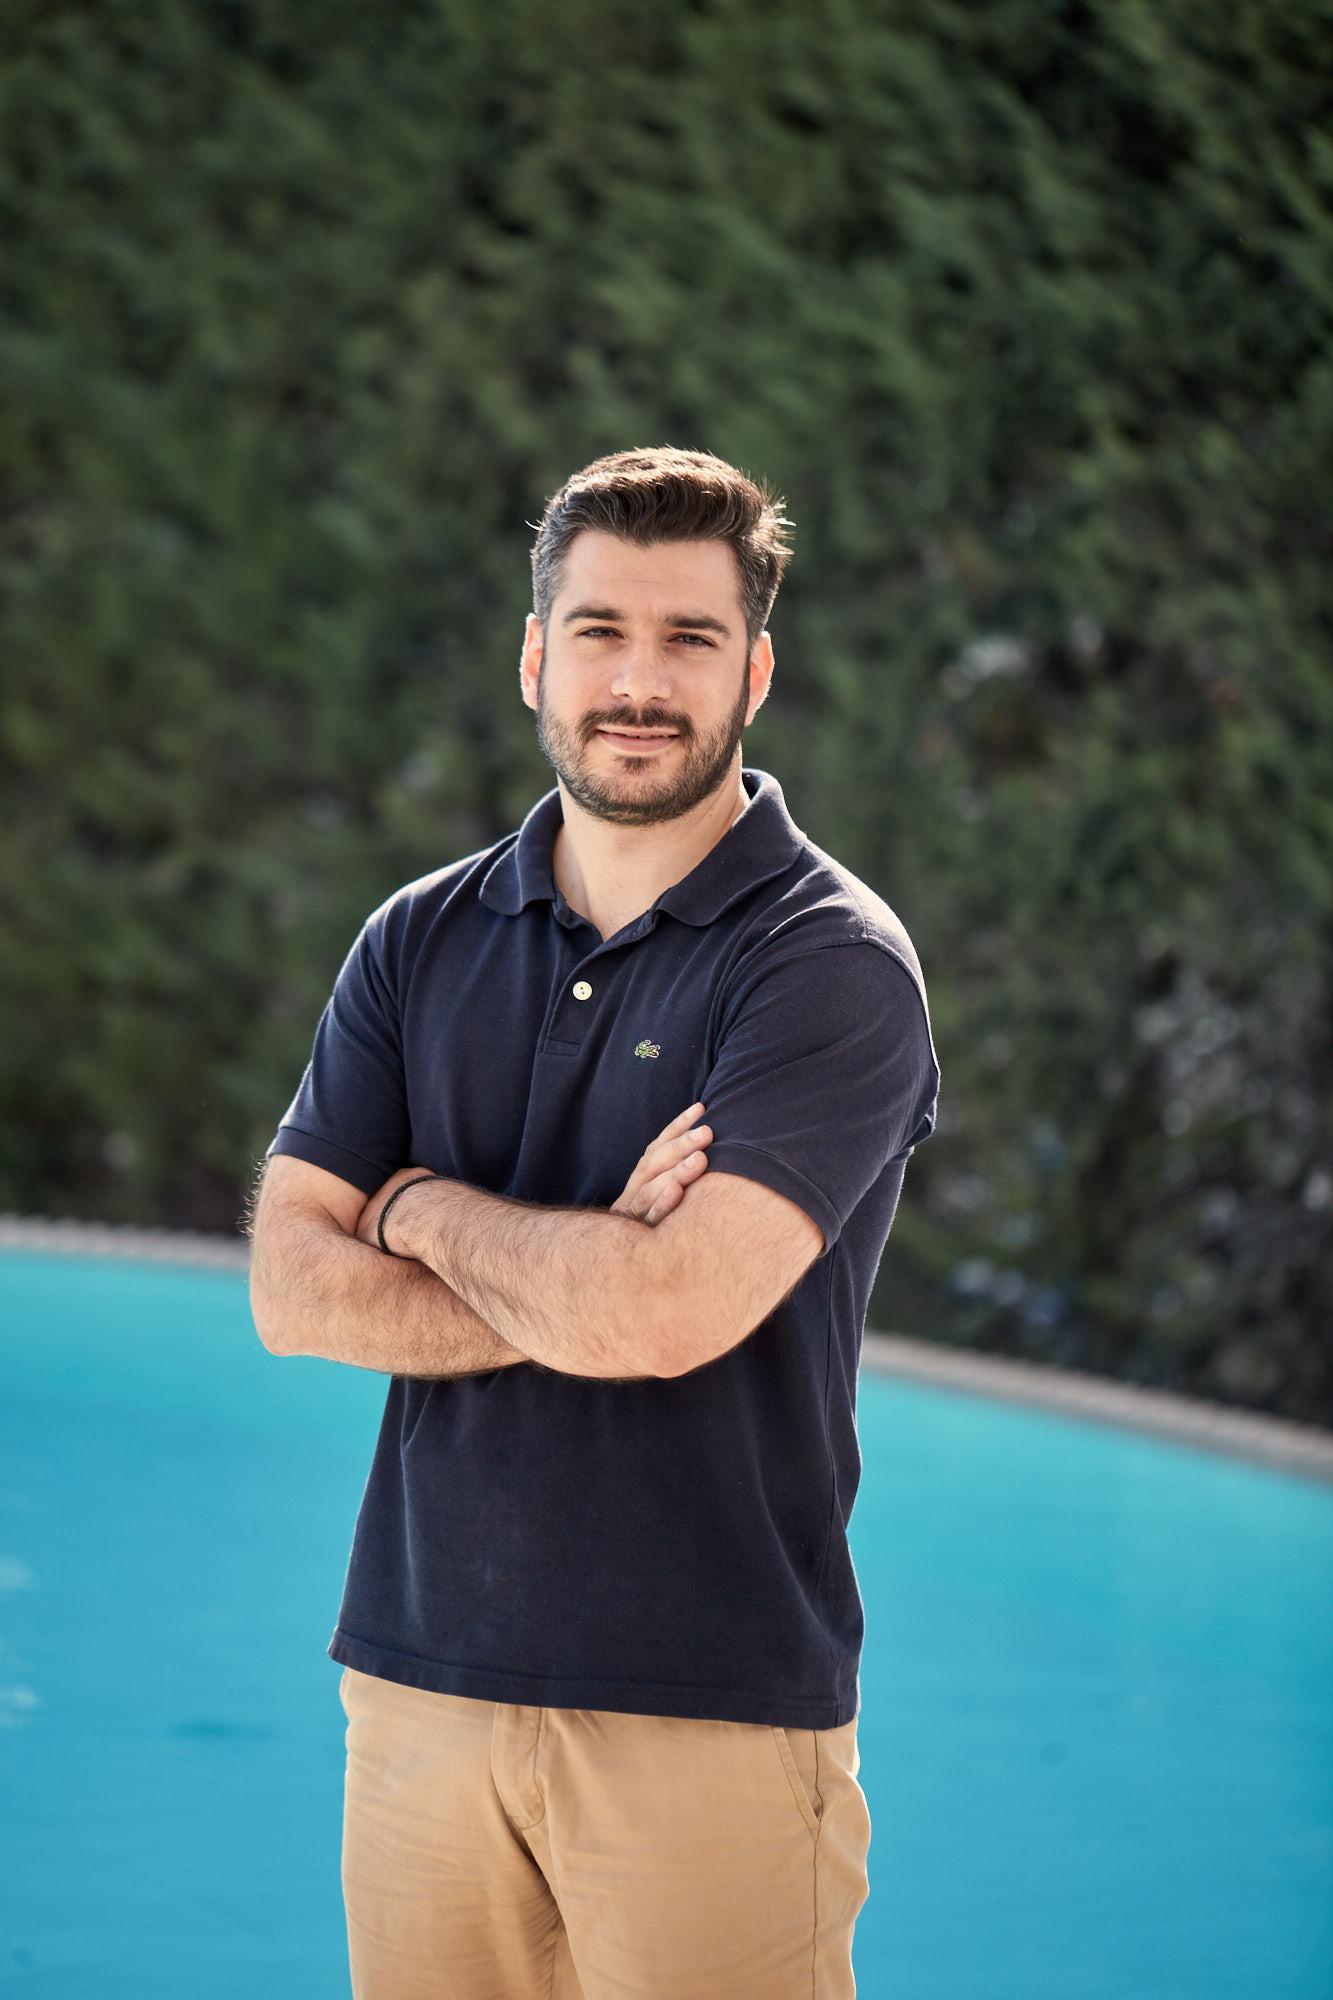 Dimitris Apostolopoulos